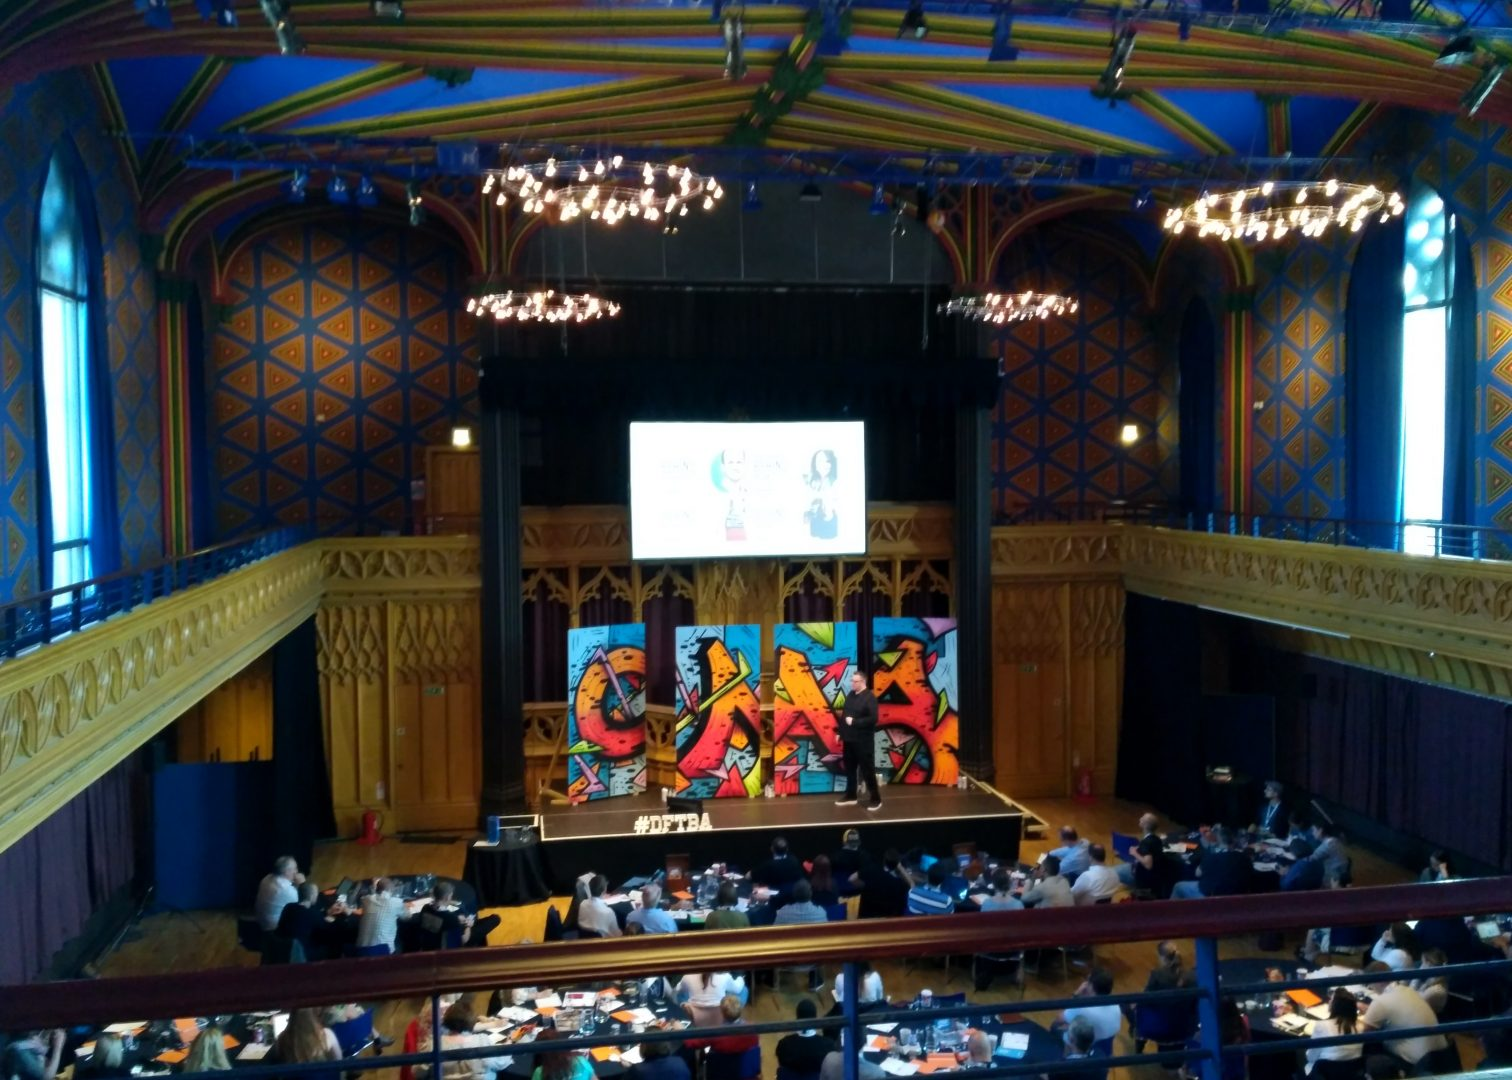 co-som-si-odniesla-z-konferencie-cma-live-v-edinburghu